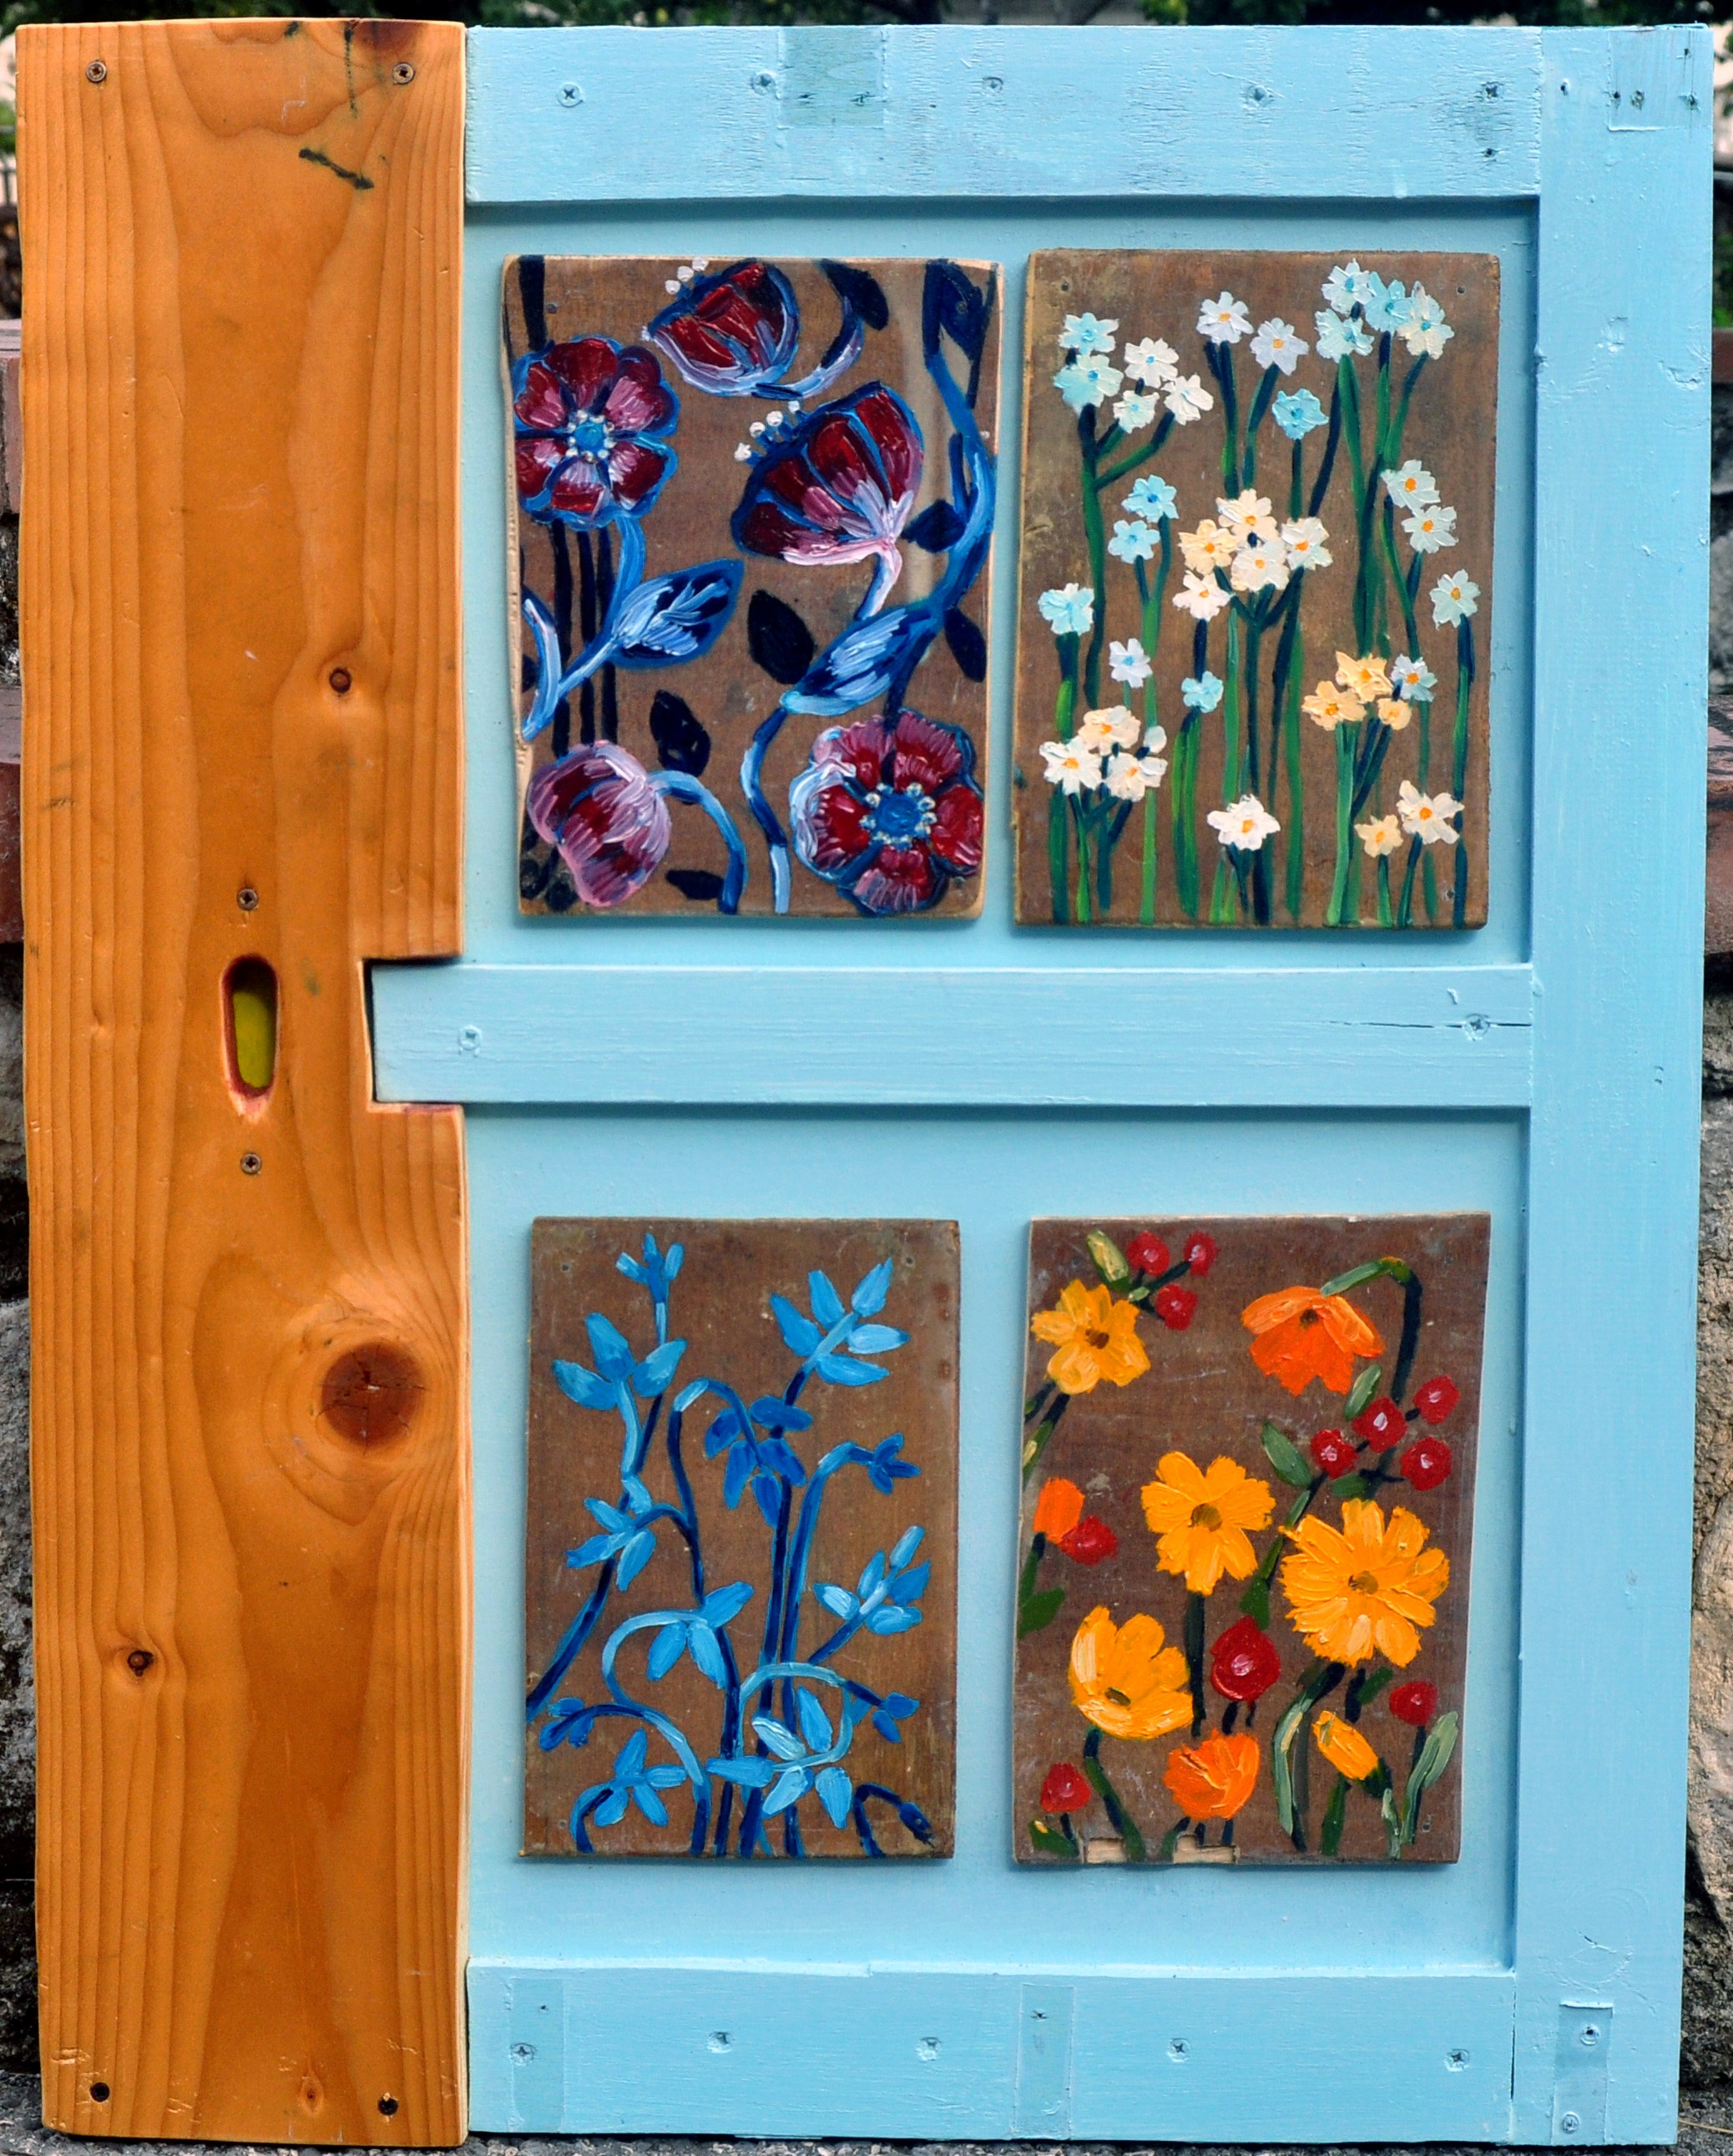 Finestra- Window